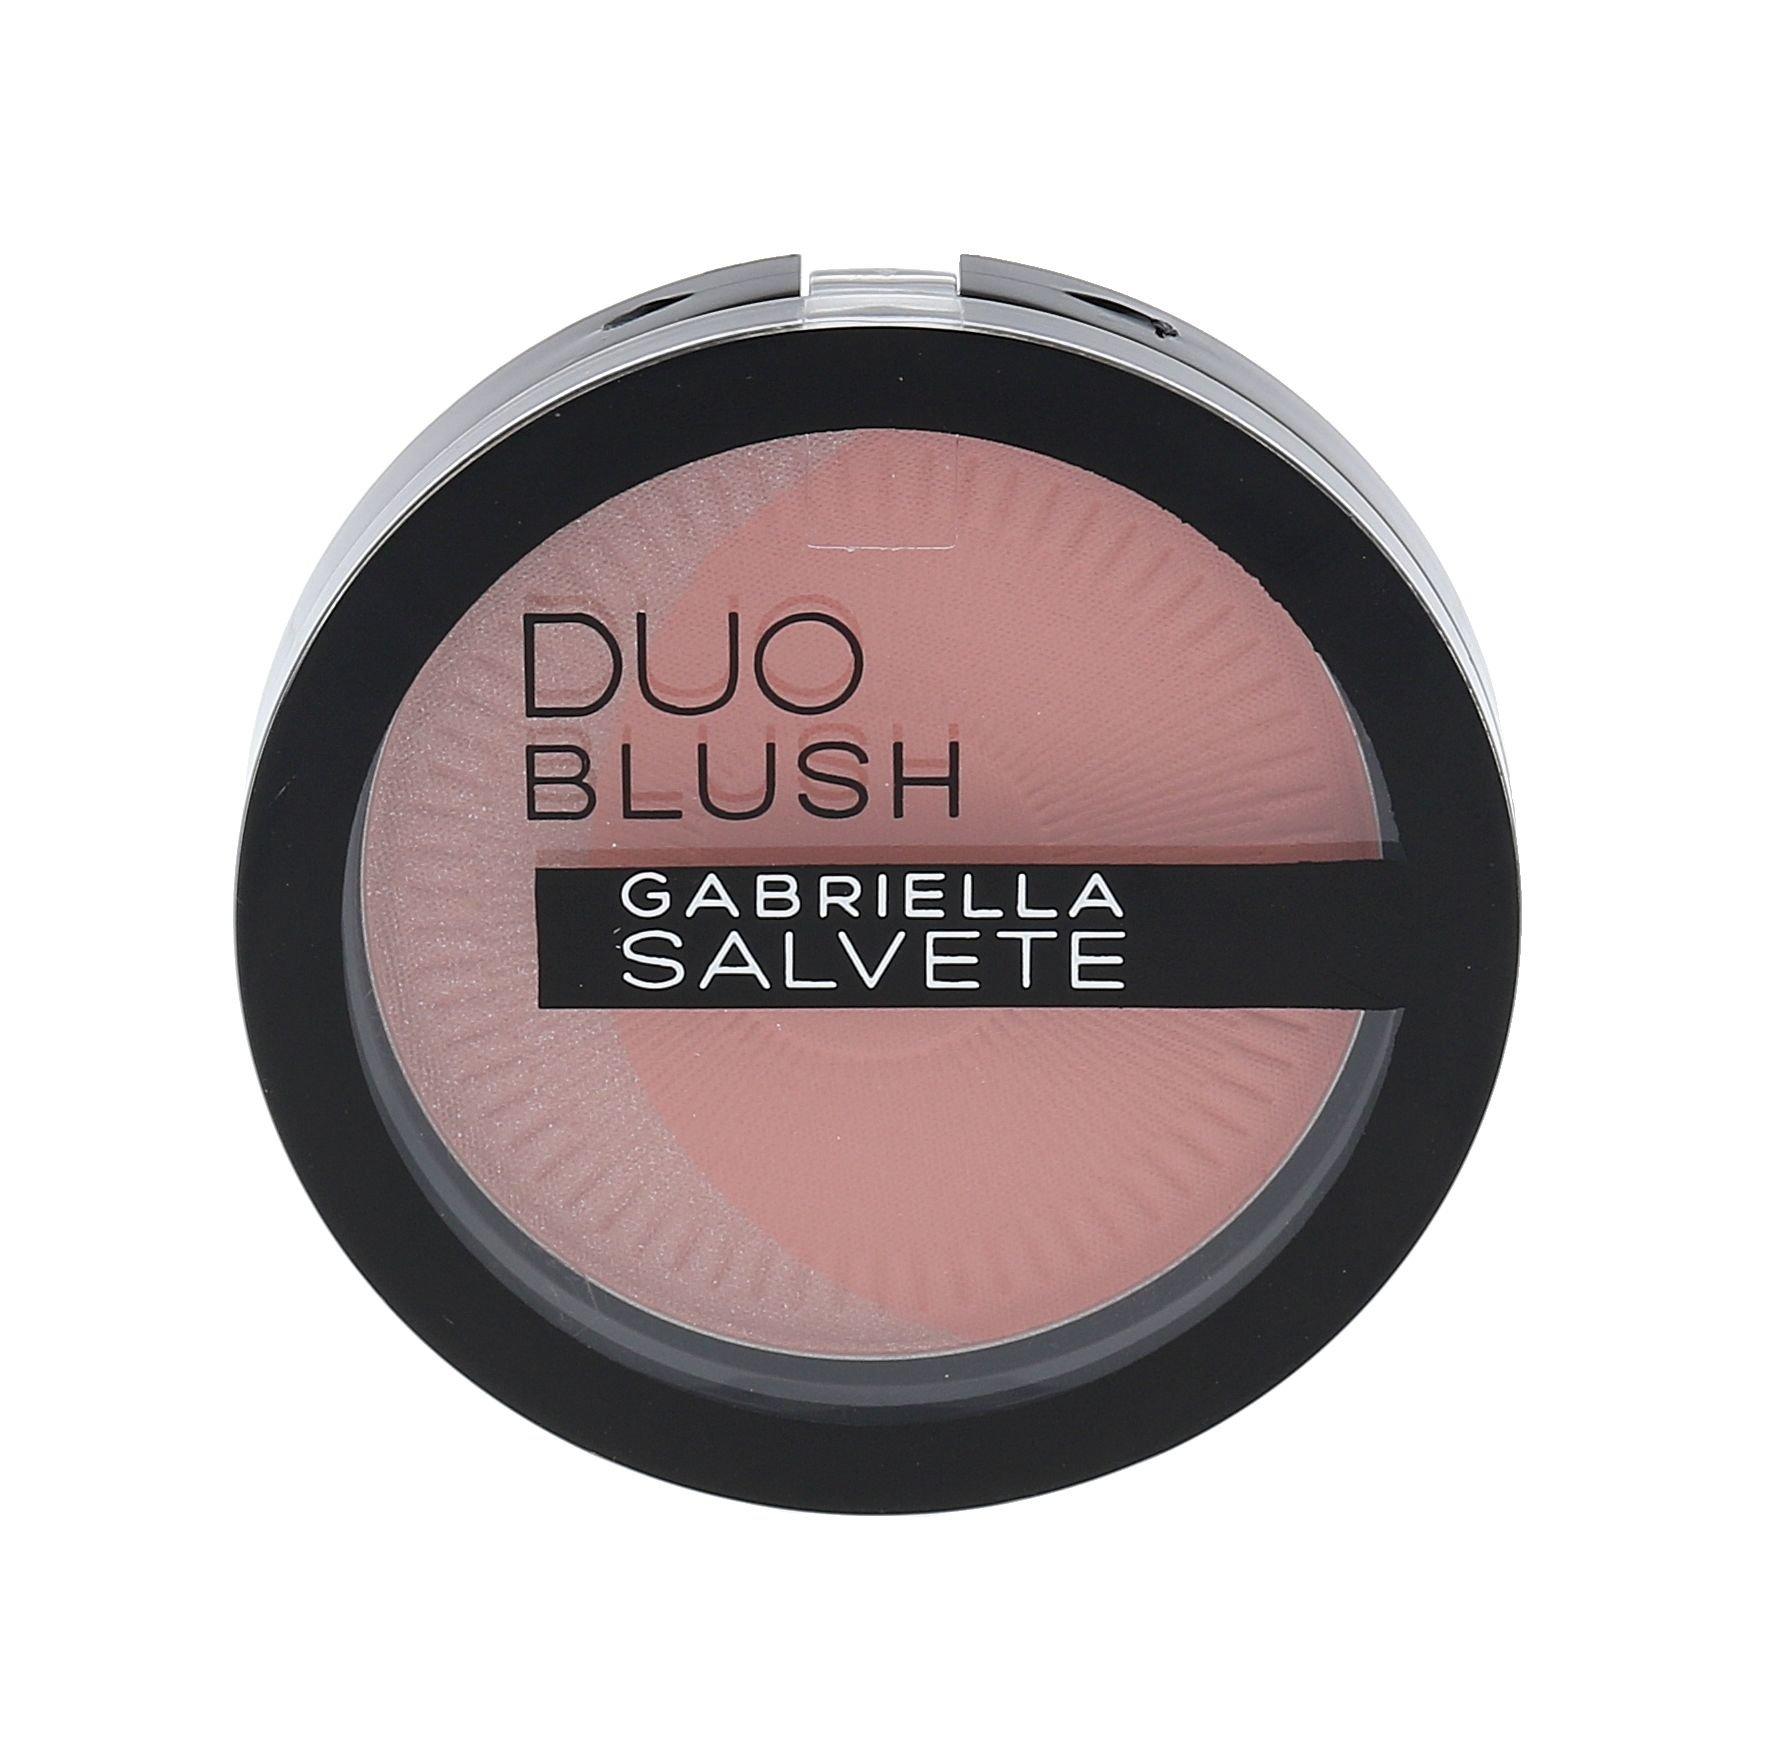 Gabriella Salvete Duo Blush Cosmetic 8g 02